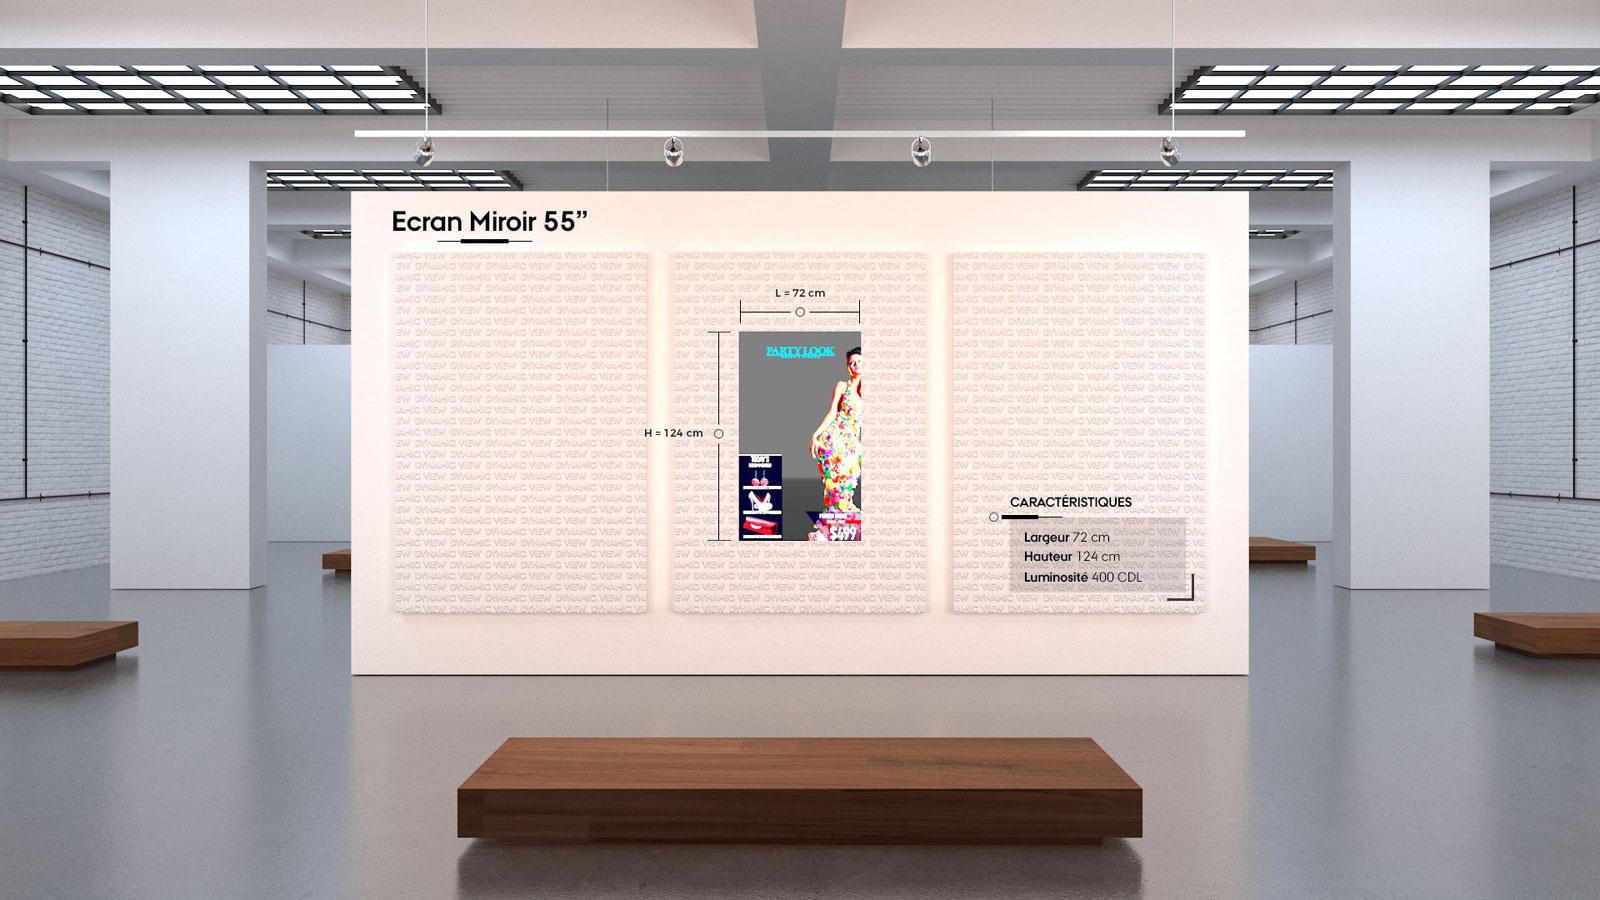 18 Ecran Miroir 55''